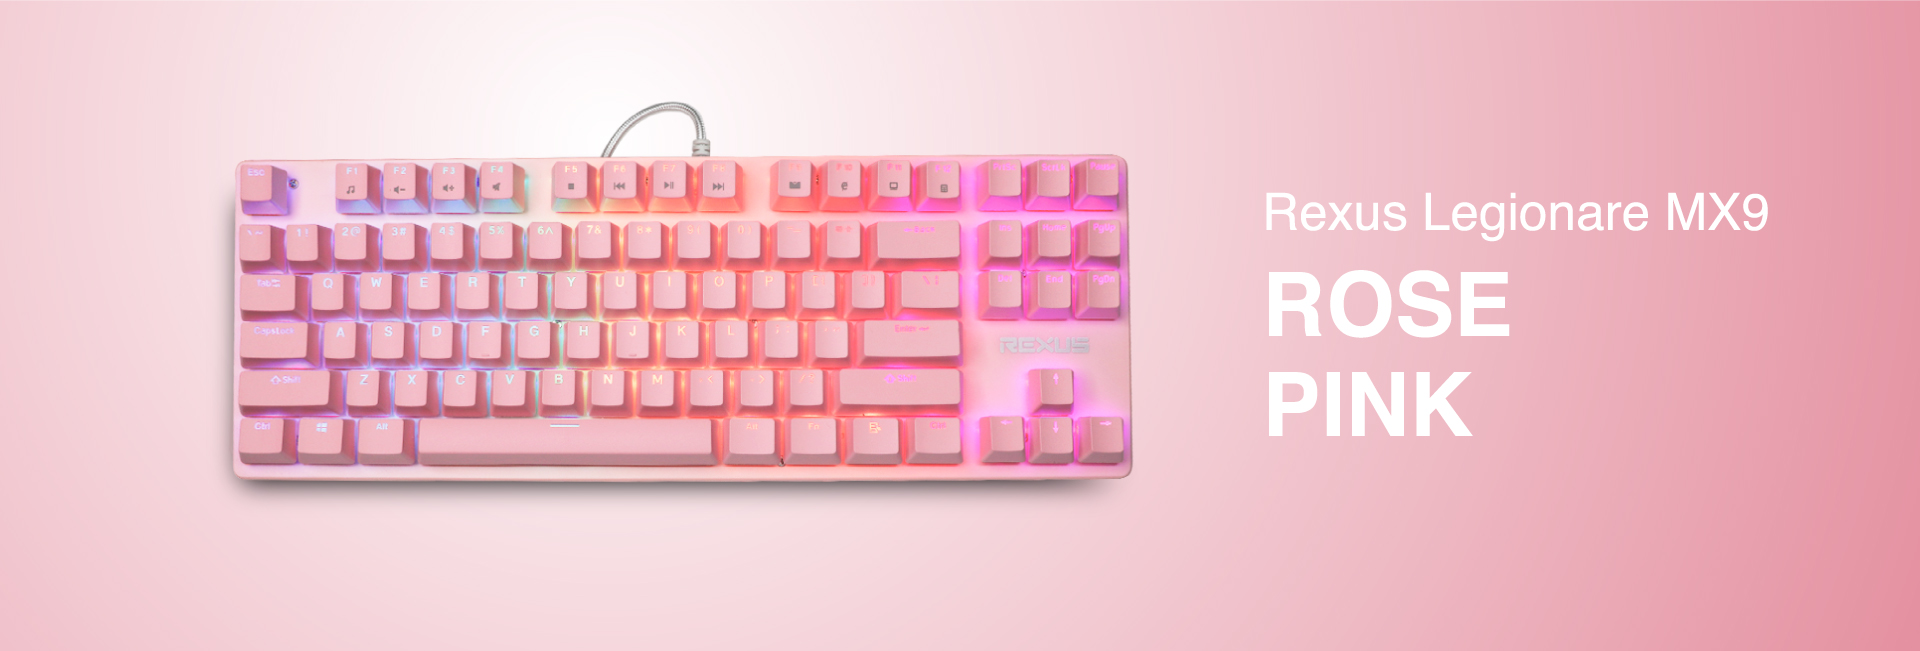 keyboard gaming Rexus Legionare MX9 WL MX9 05